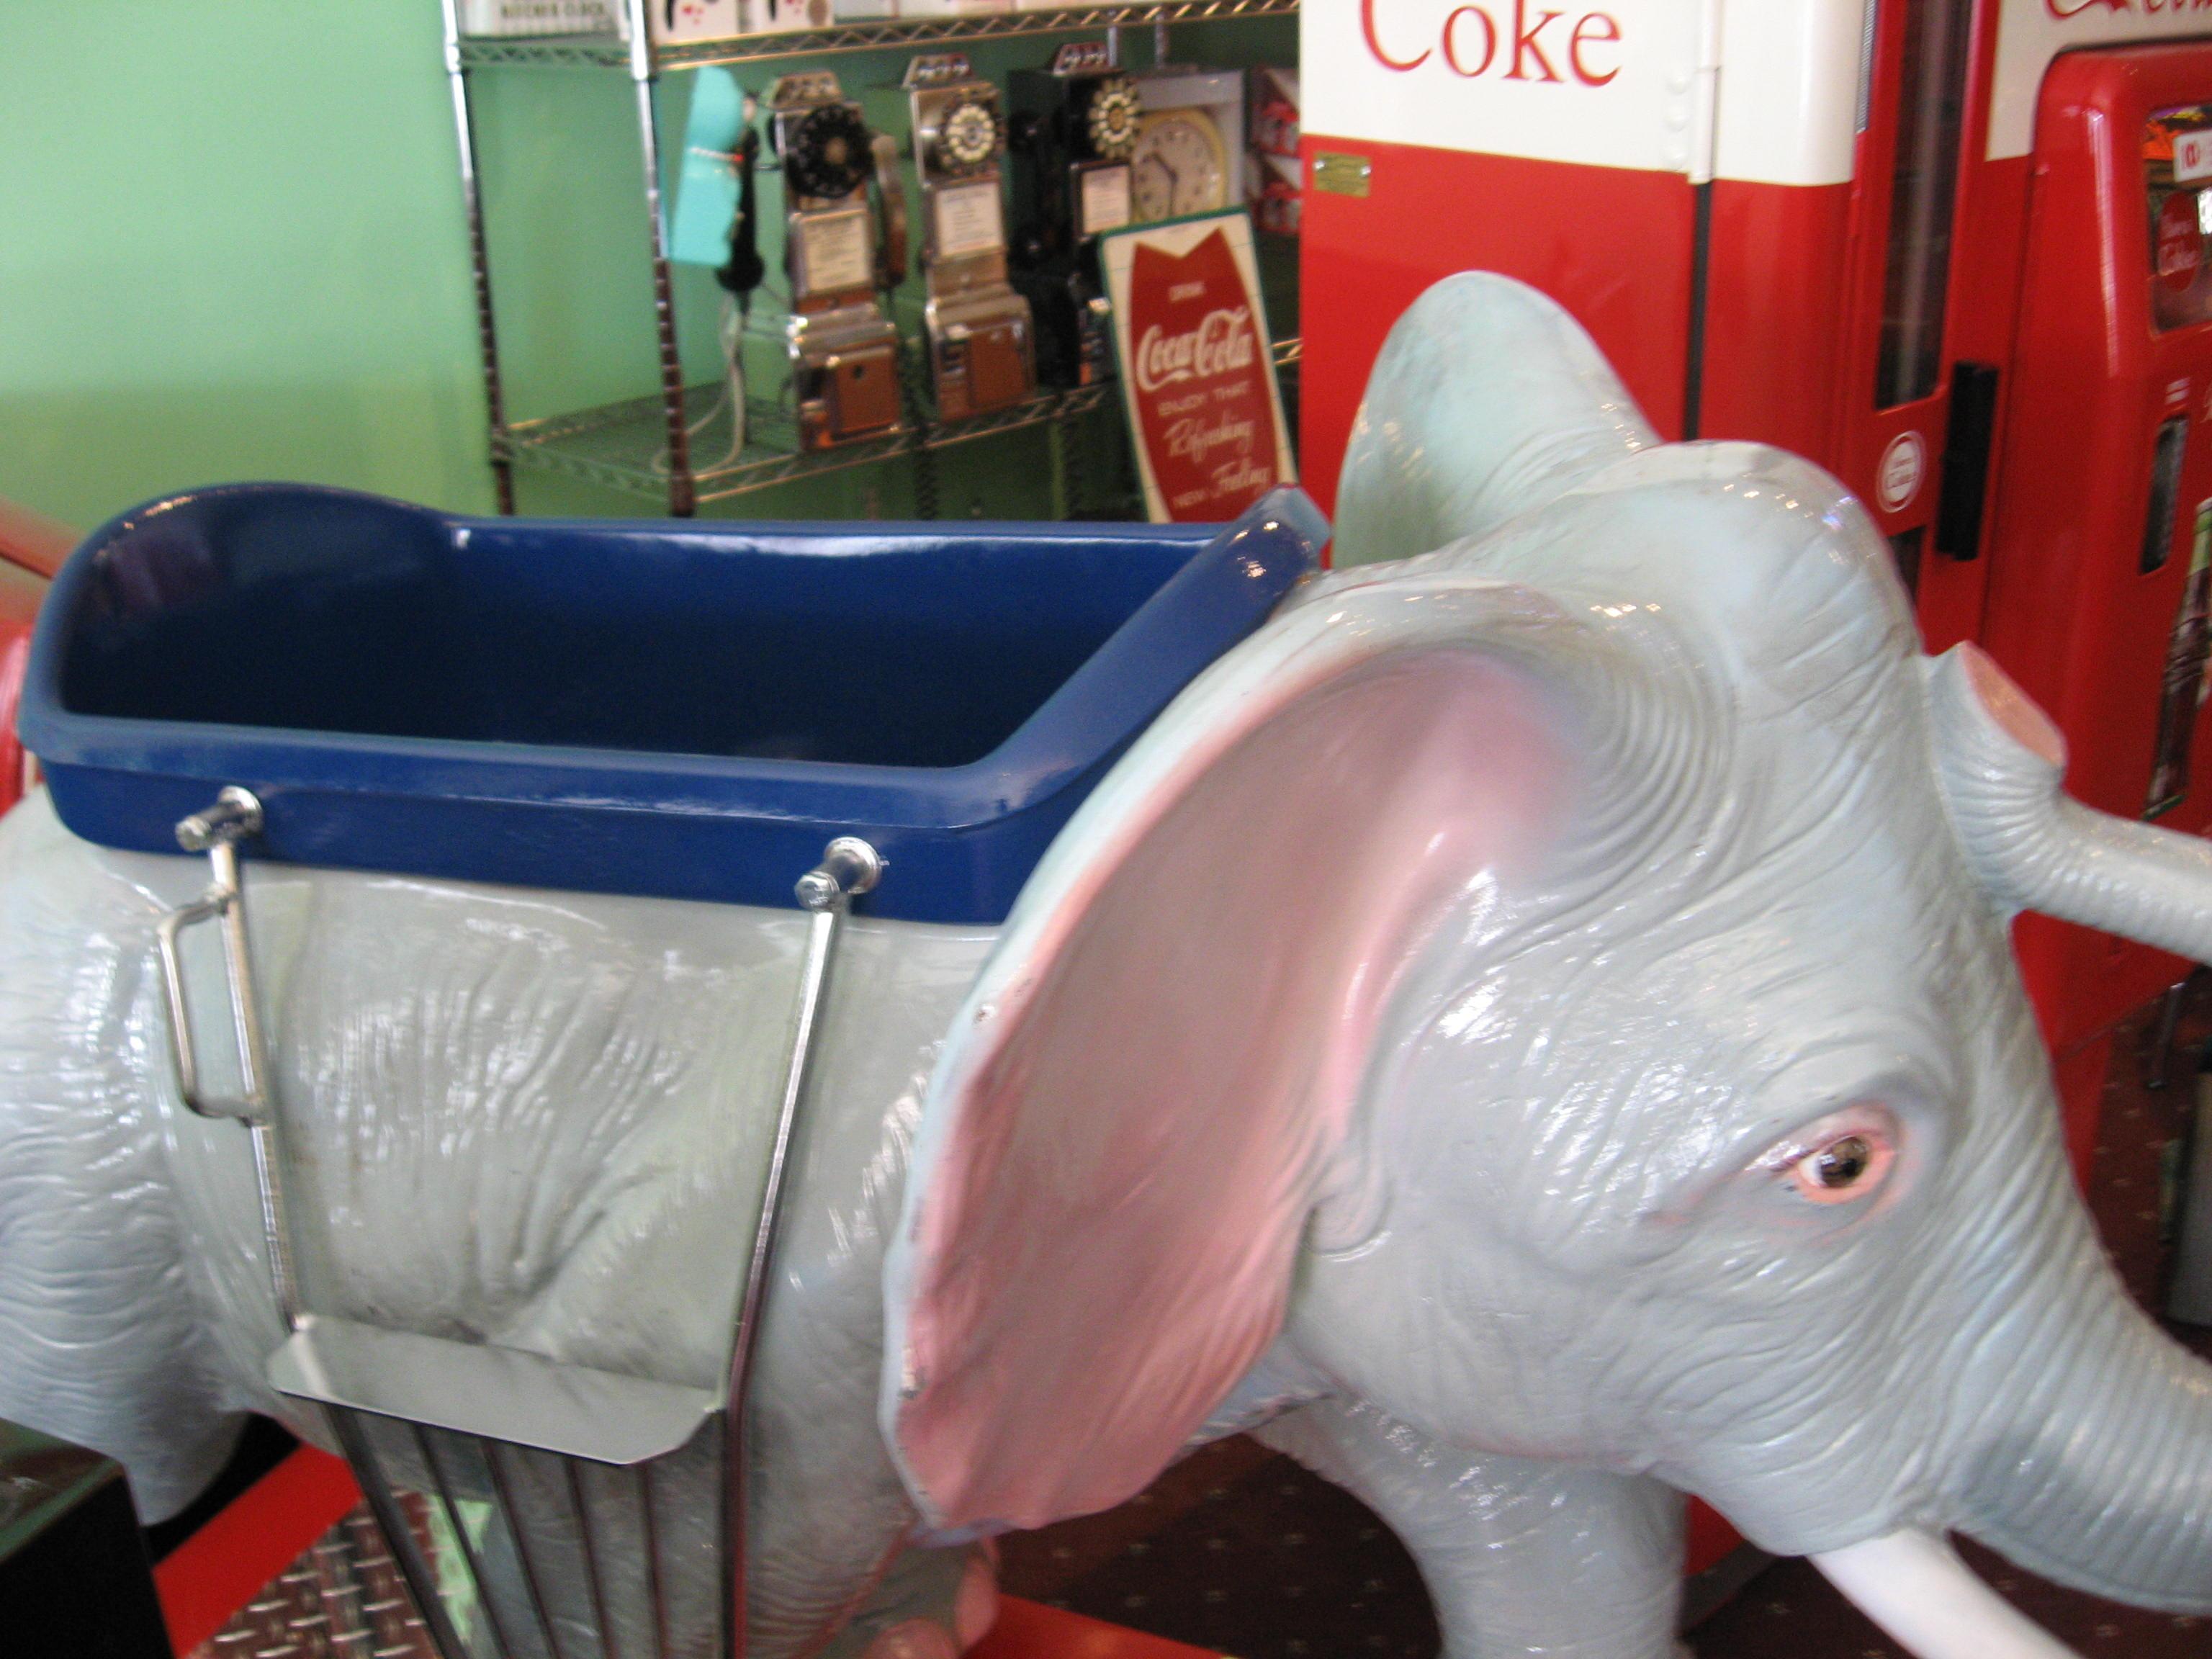 Elephant Kiddie Ride Coin Operated Restored Original